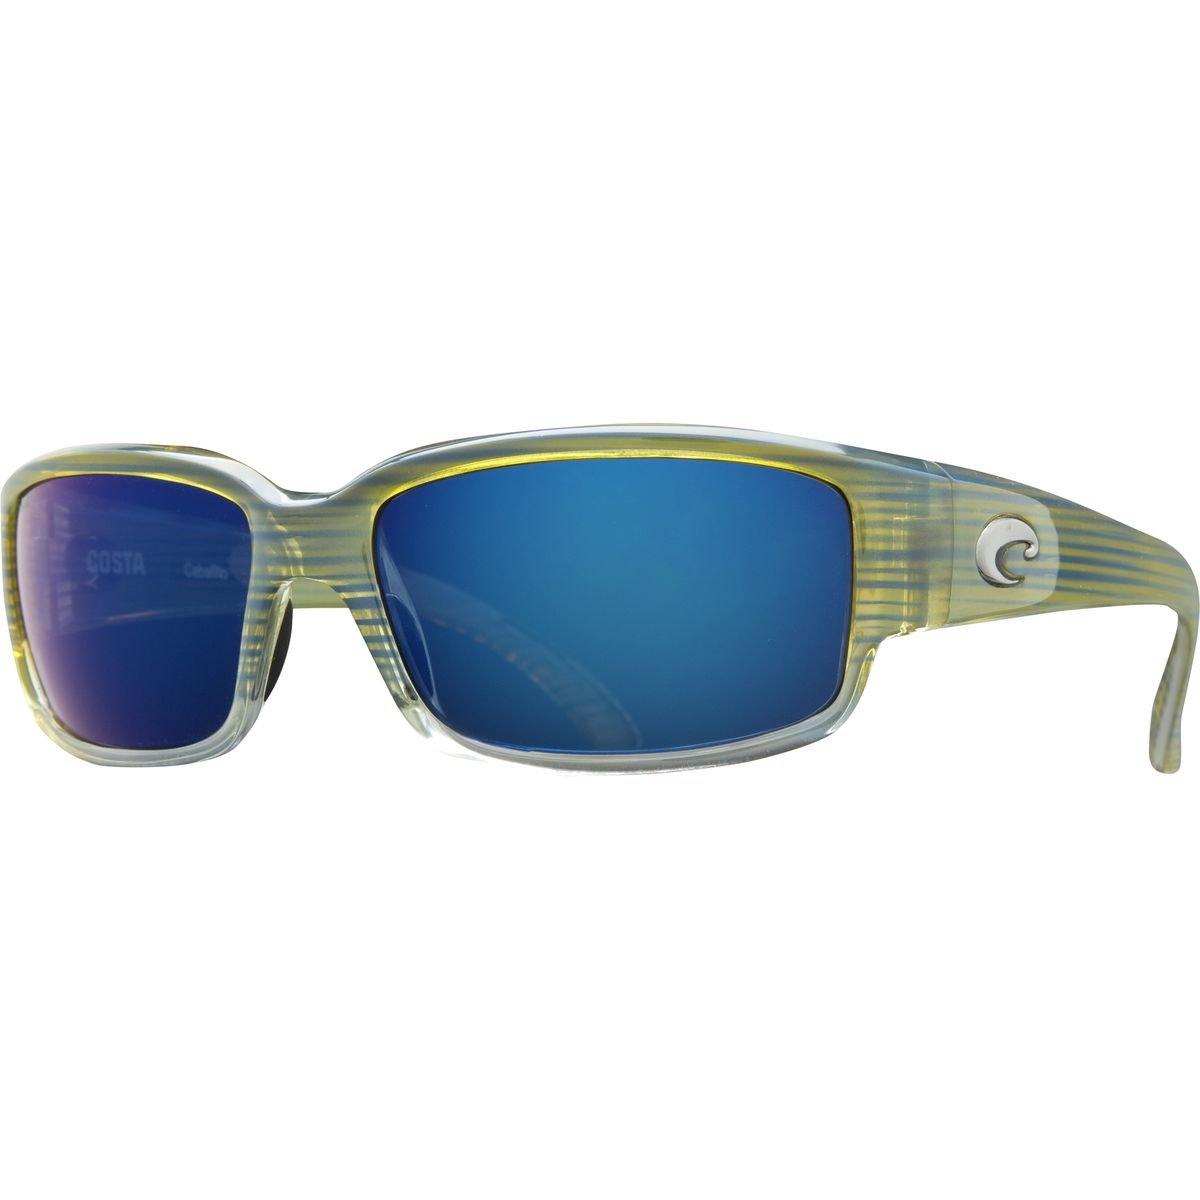 77523d2df03c8 Amazon.com  Costa Del Mar Kenny Chesney Caballito Vanillia Sky Frames Blue  Mirror 580P Lense  Shoes